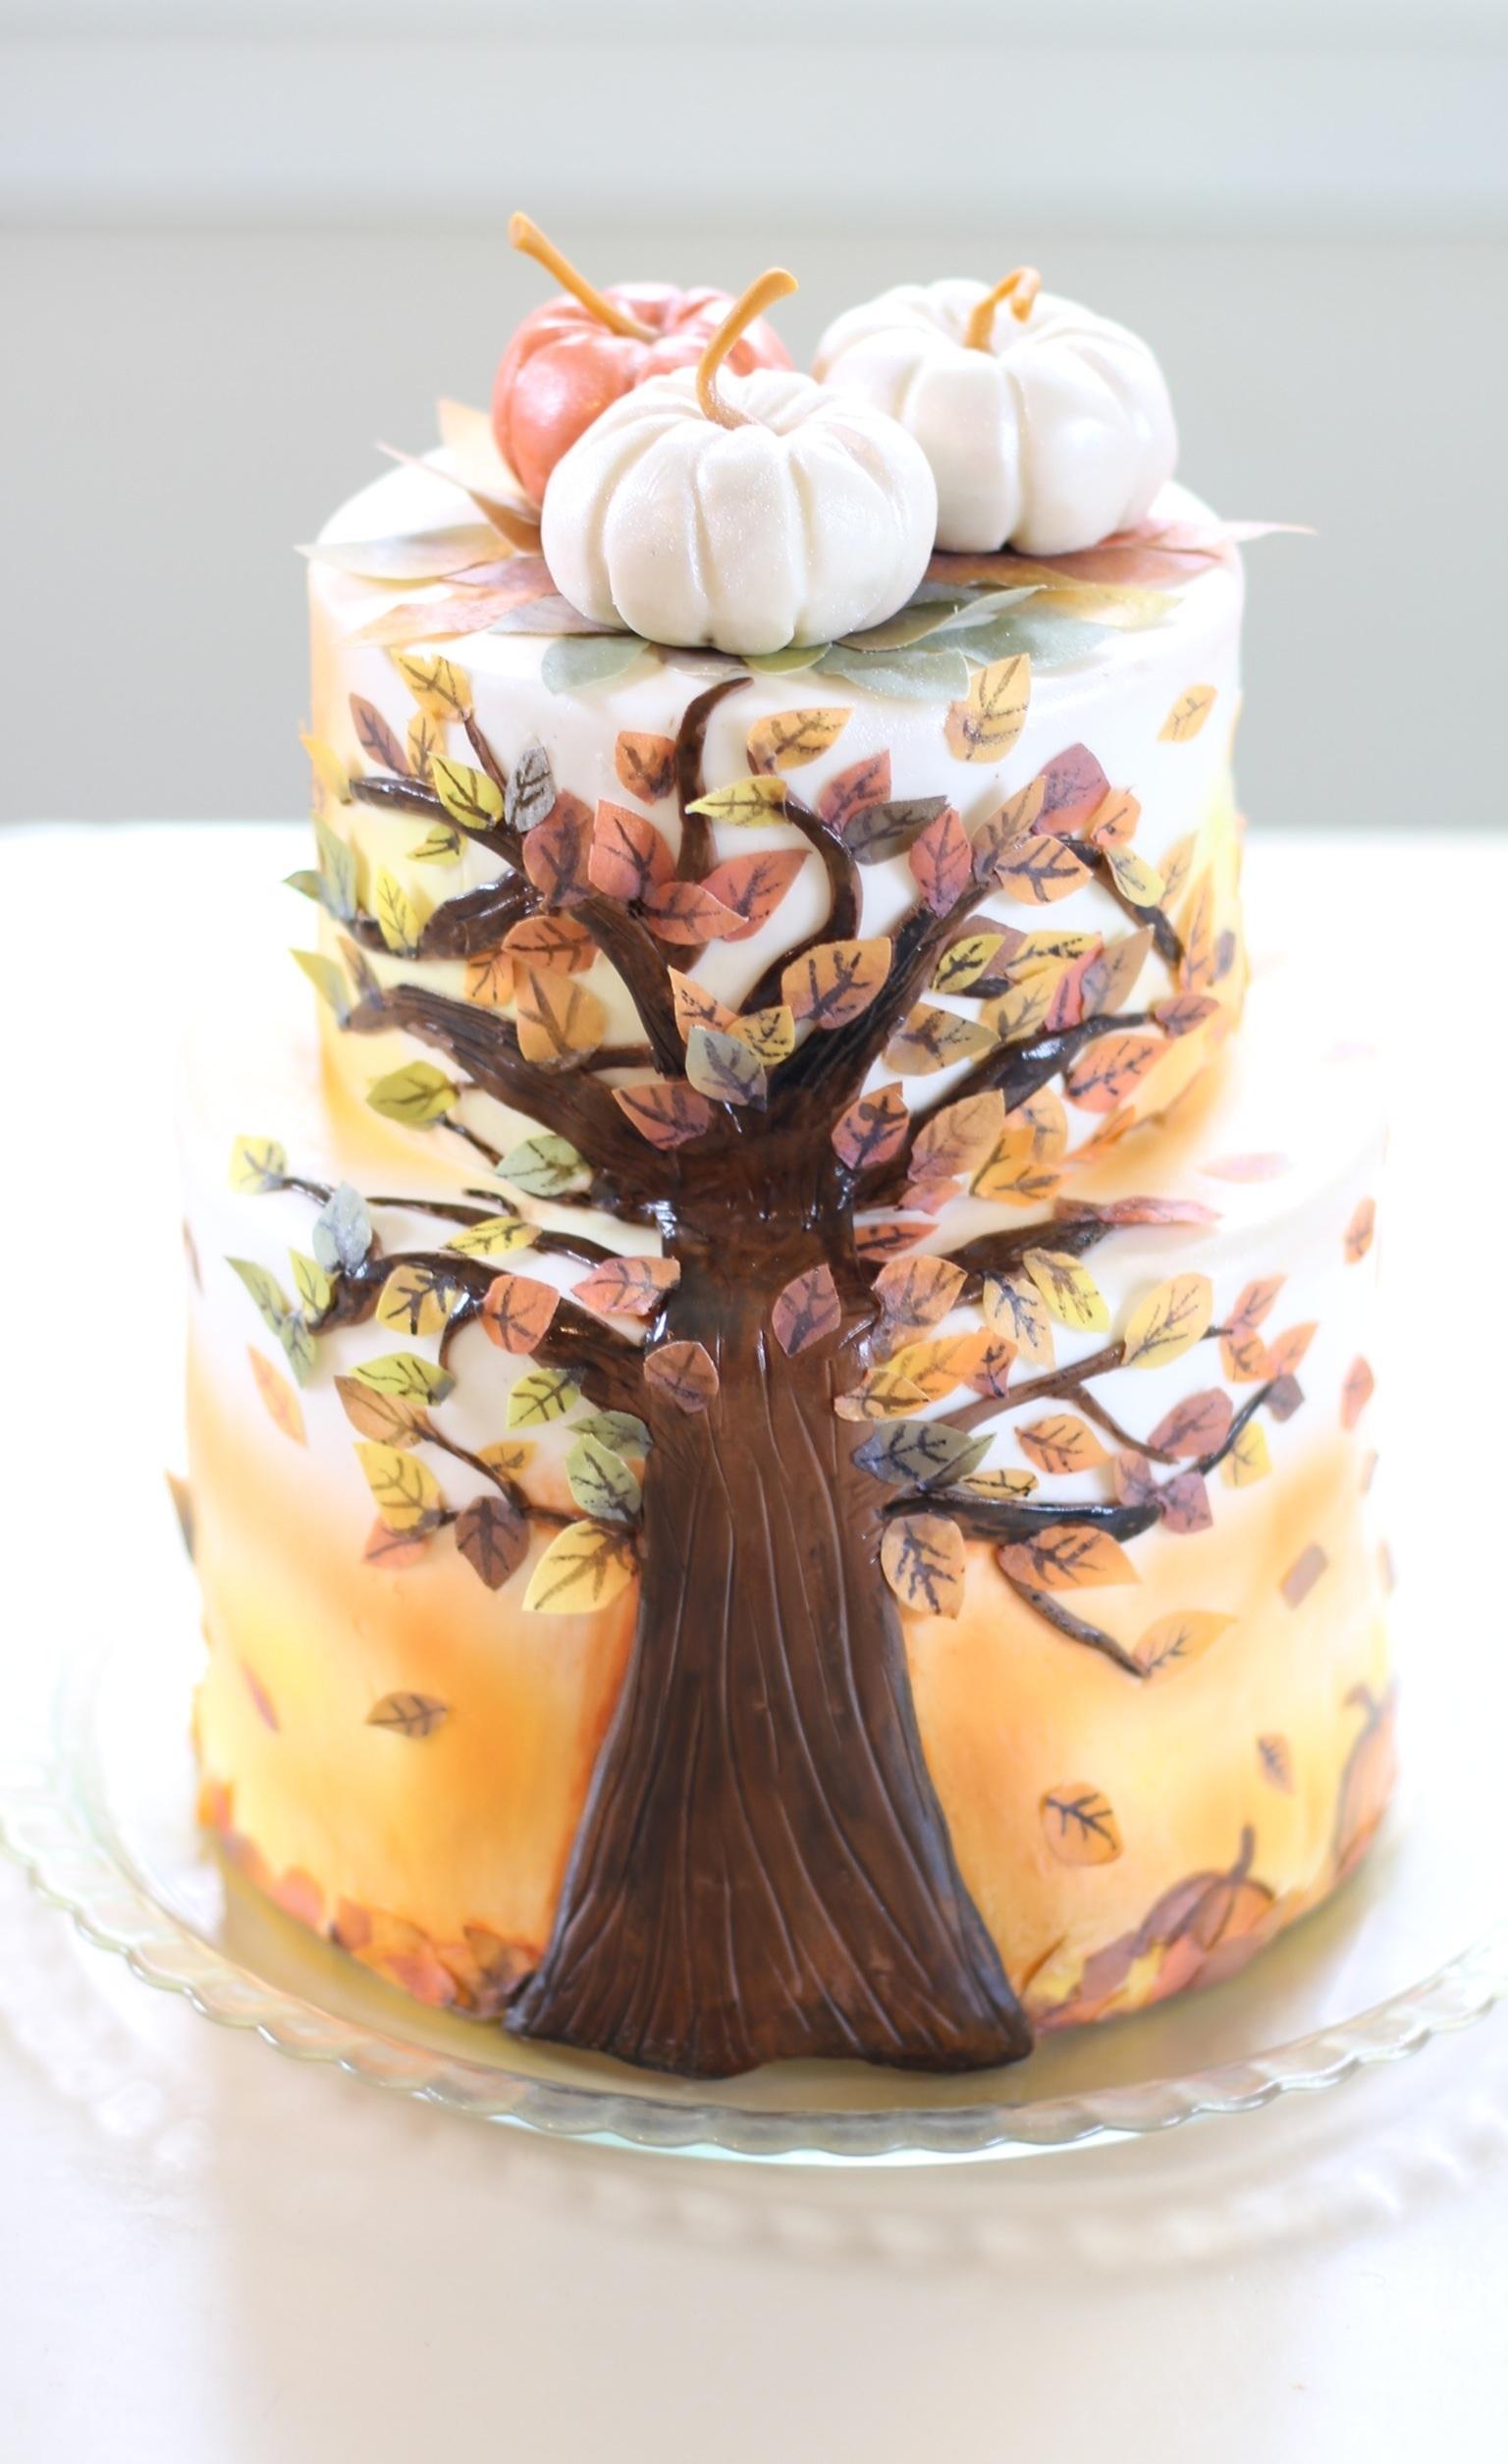 Cake Decorating How To Make A Leaf : Fall Leaf Cake - CakeCentral.com